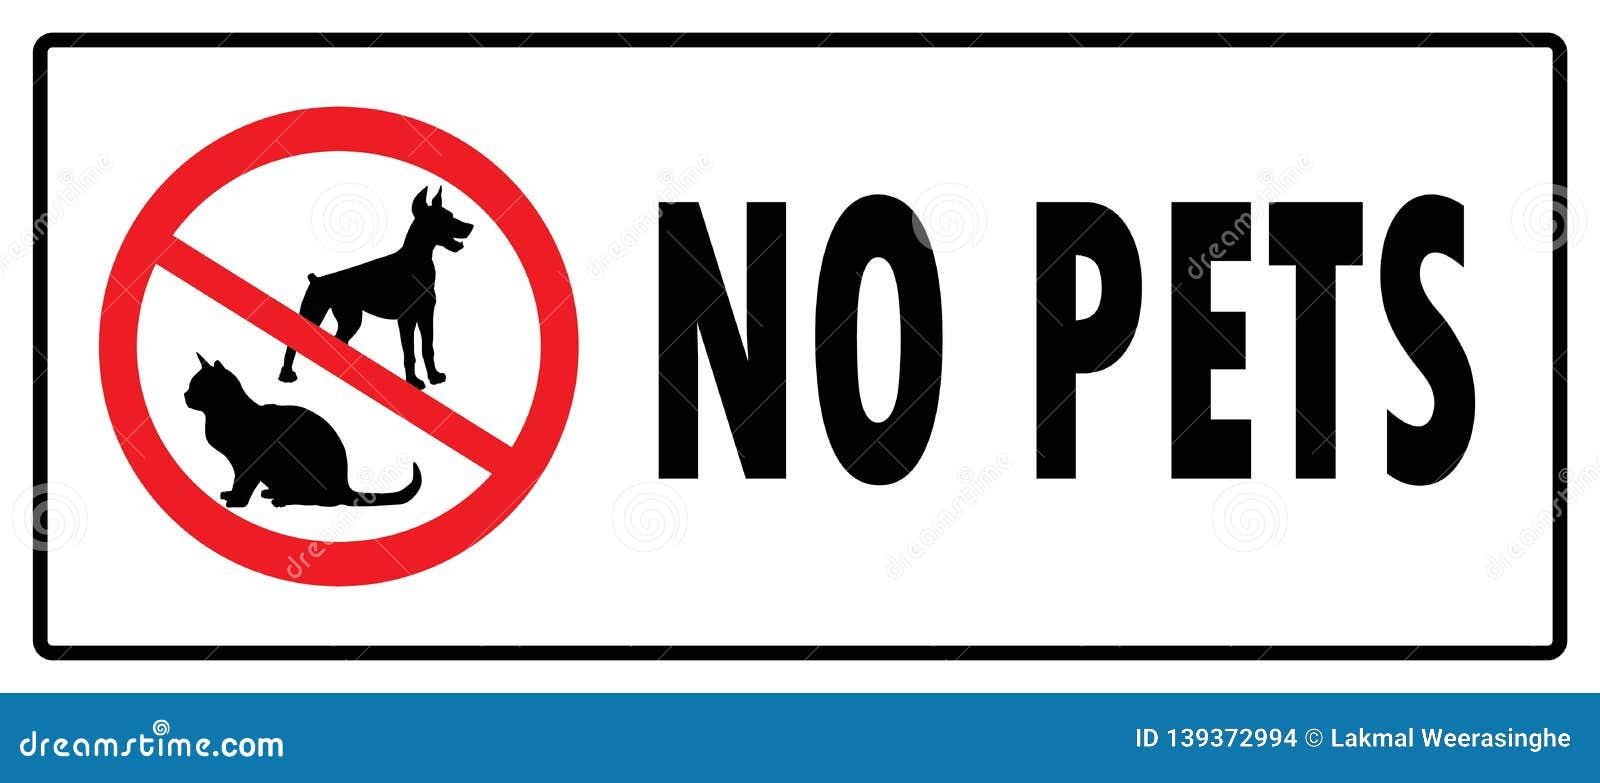 No pets symbol.No Dogs sign and No Cats sign